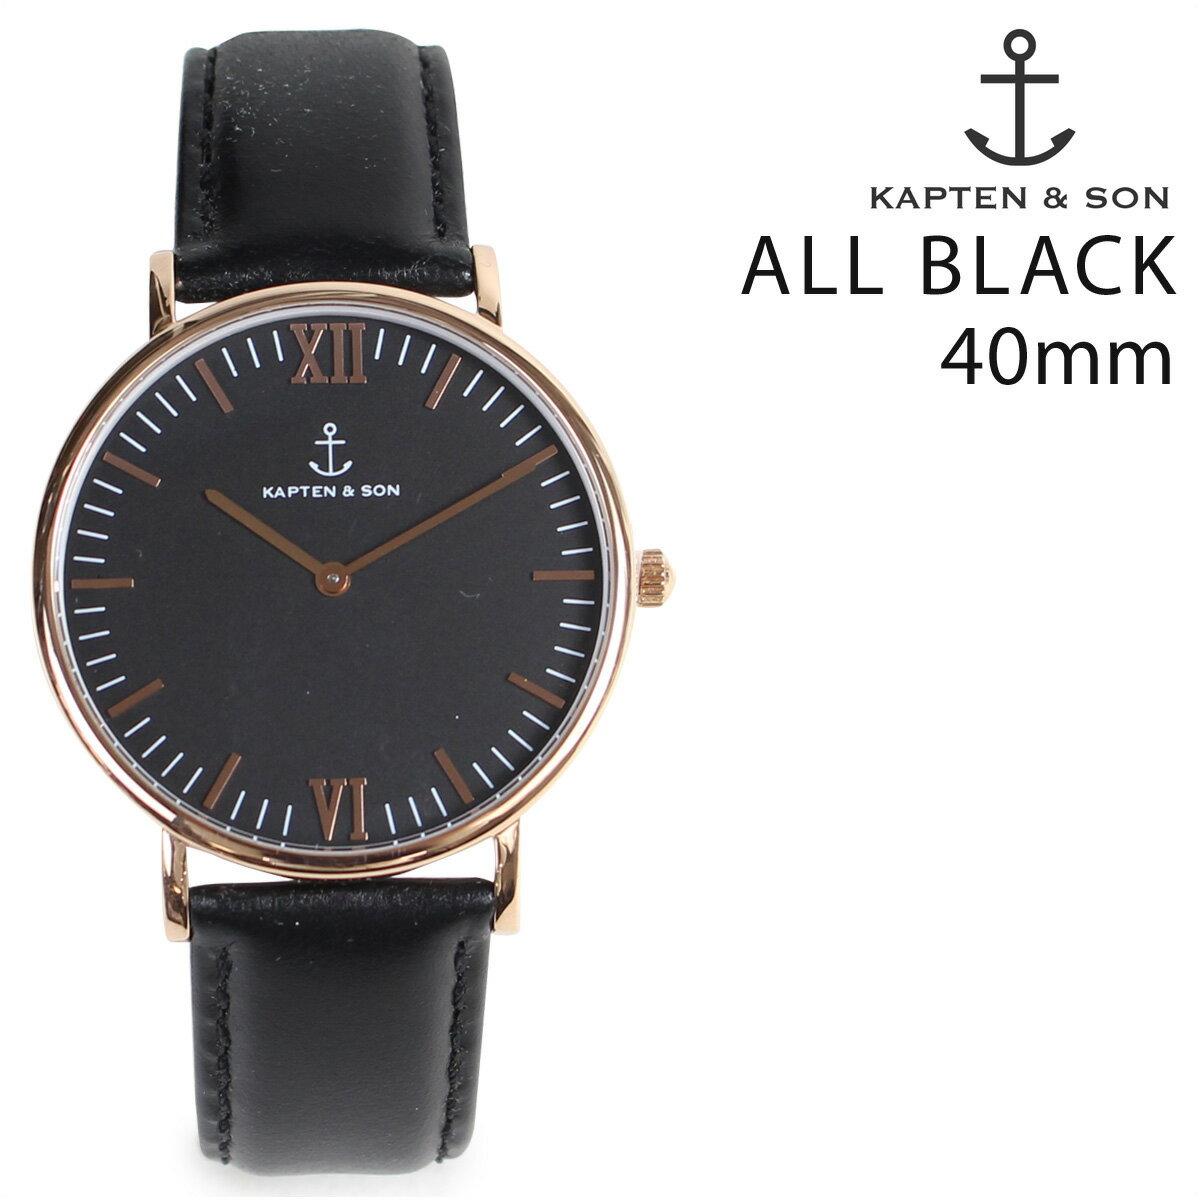 KAPTEN&SON キャプテンアンドサン 腕時計 時計 レディース 40mm レザー ALL BLACK ブラック